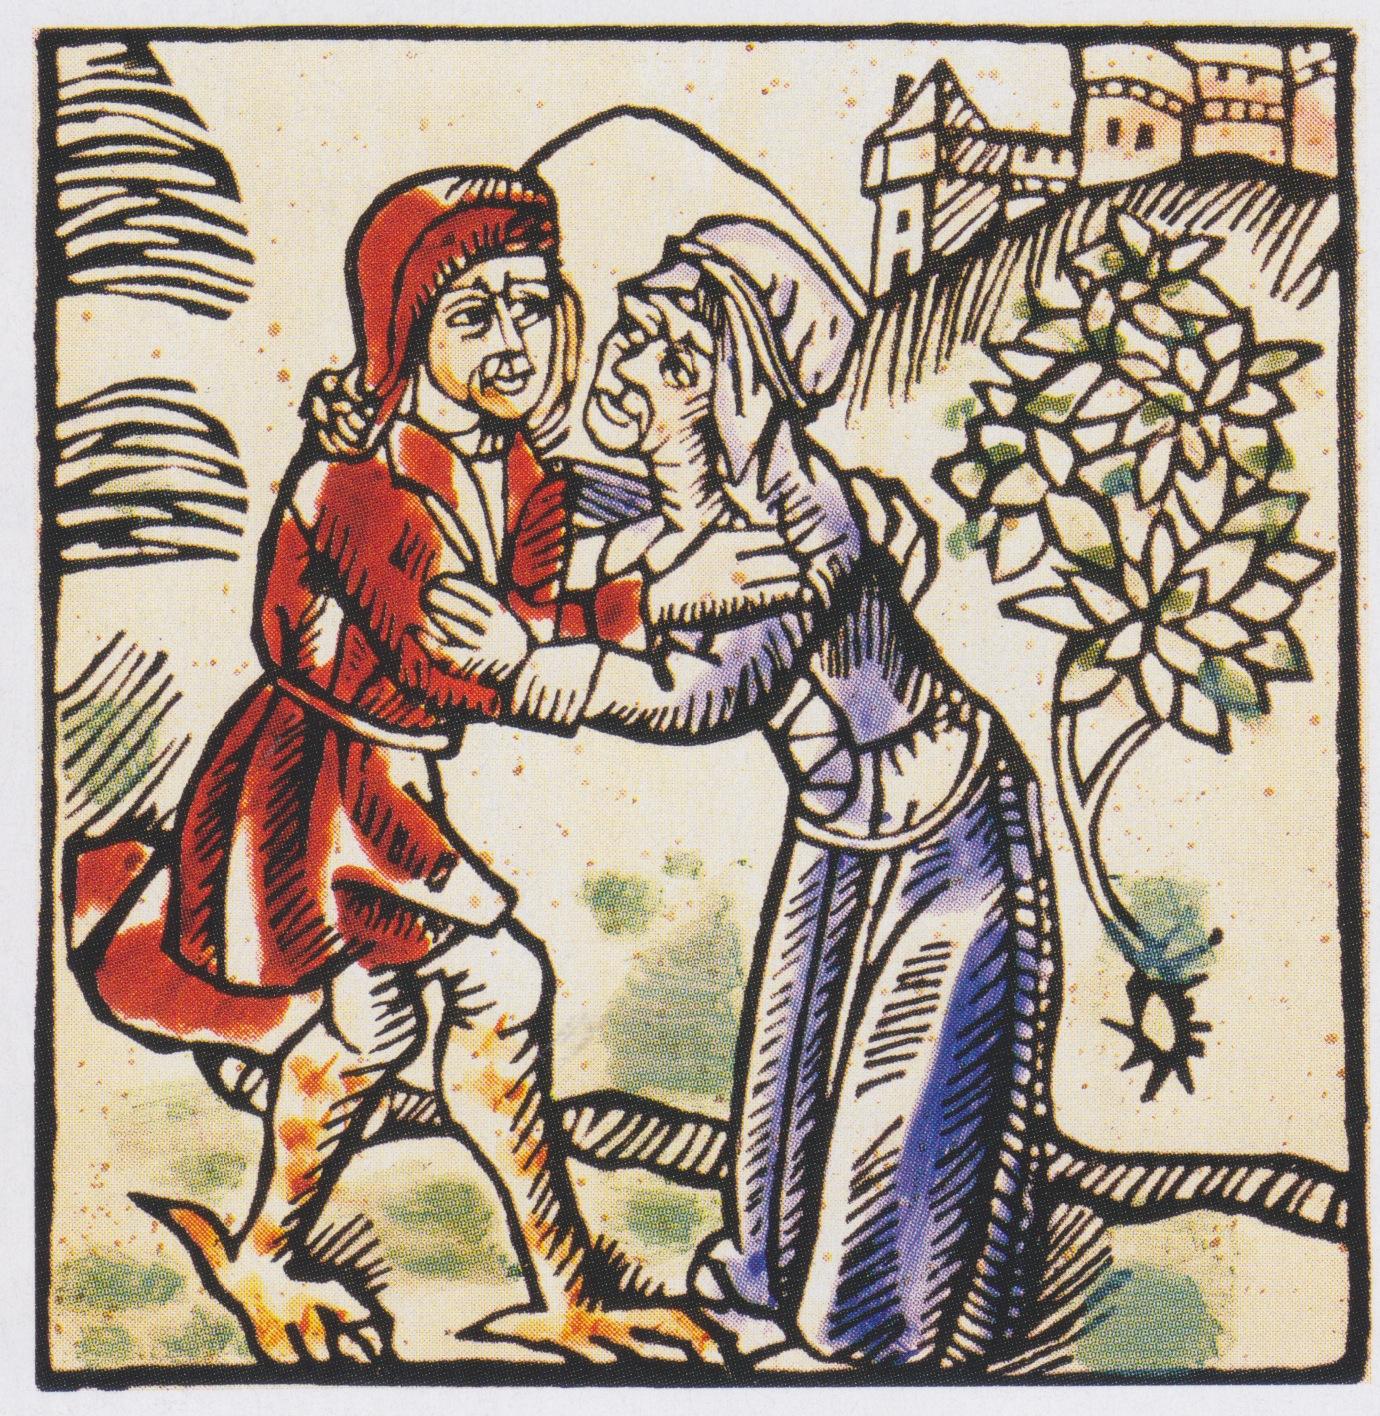 File:Hexerei - Buhlschaft mit dem Teufel.jpeg - Wikimedia